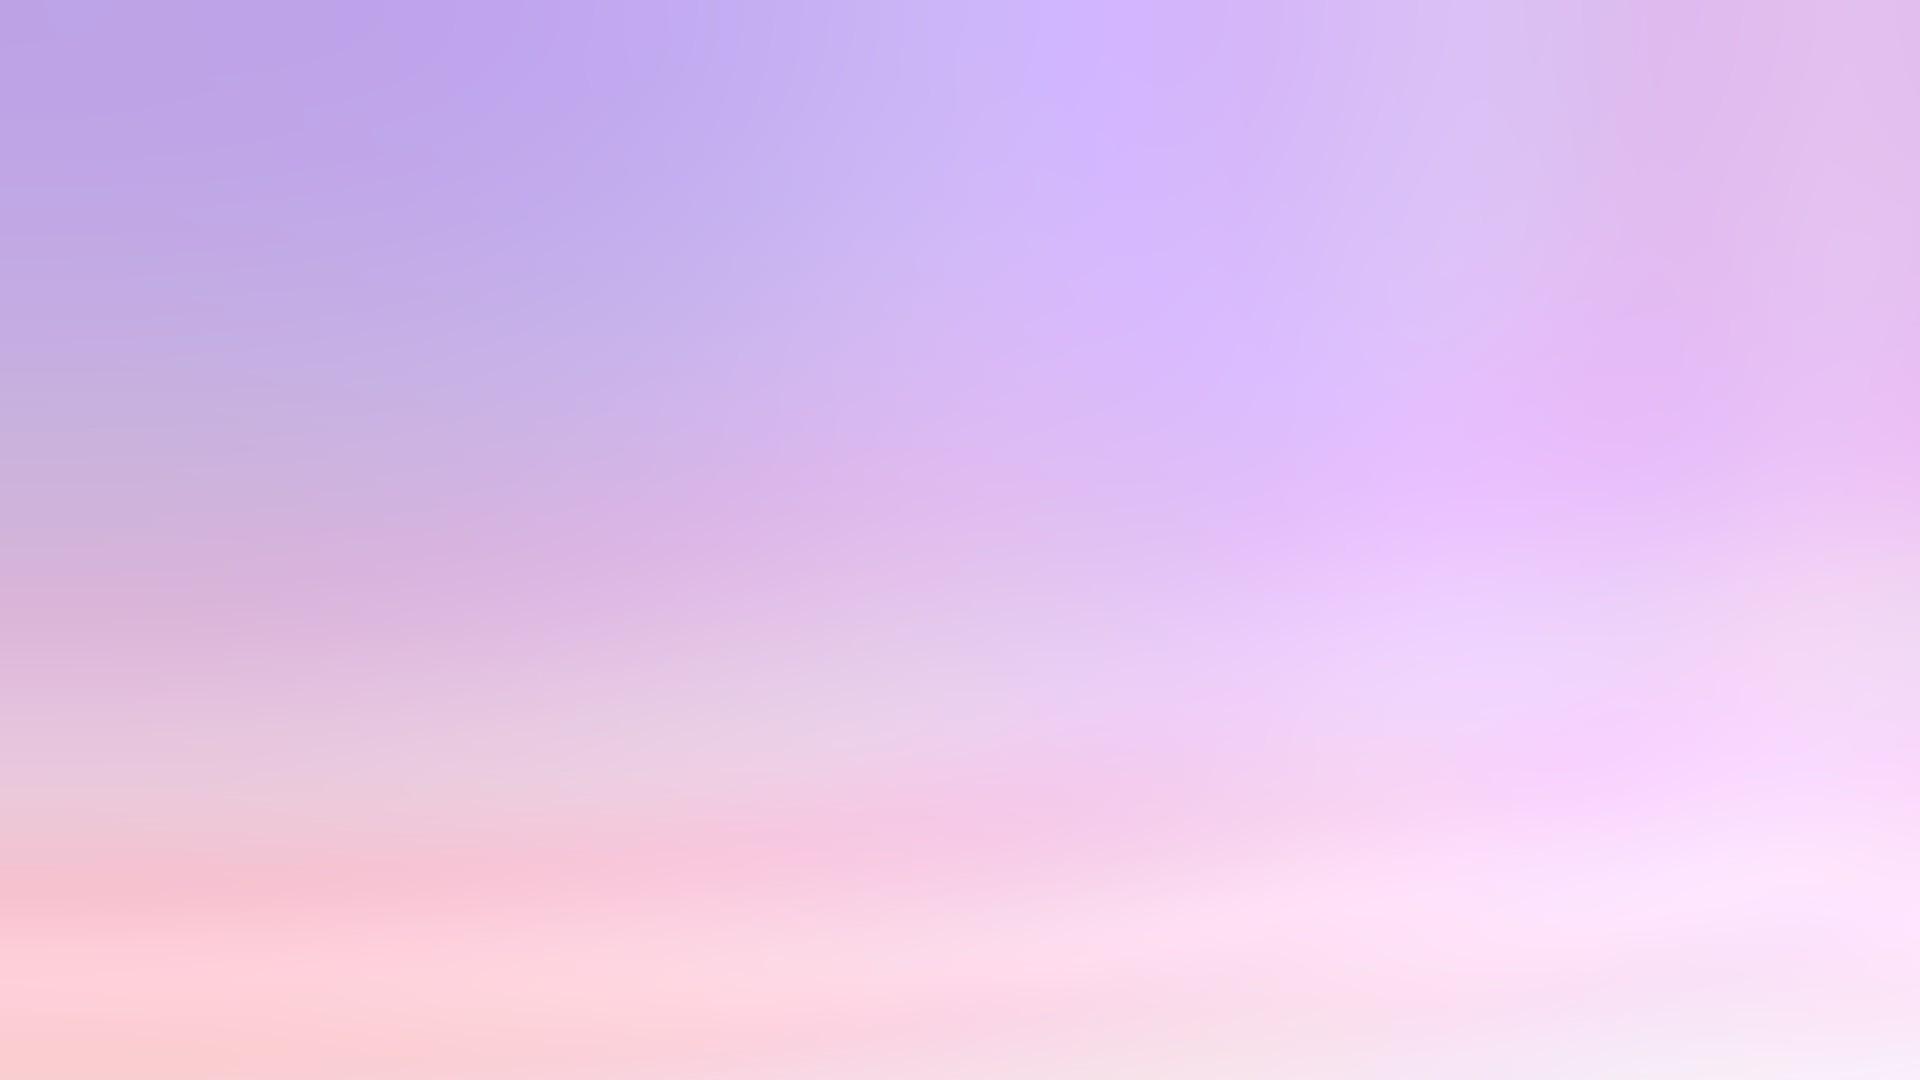 light gradient background 46250